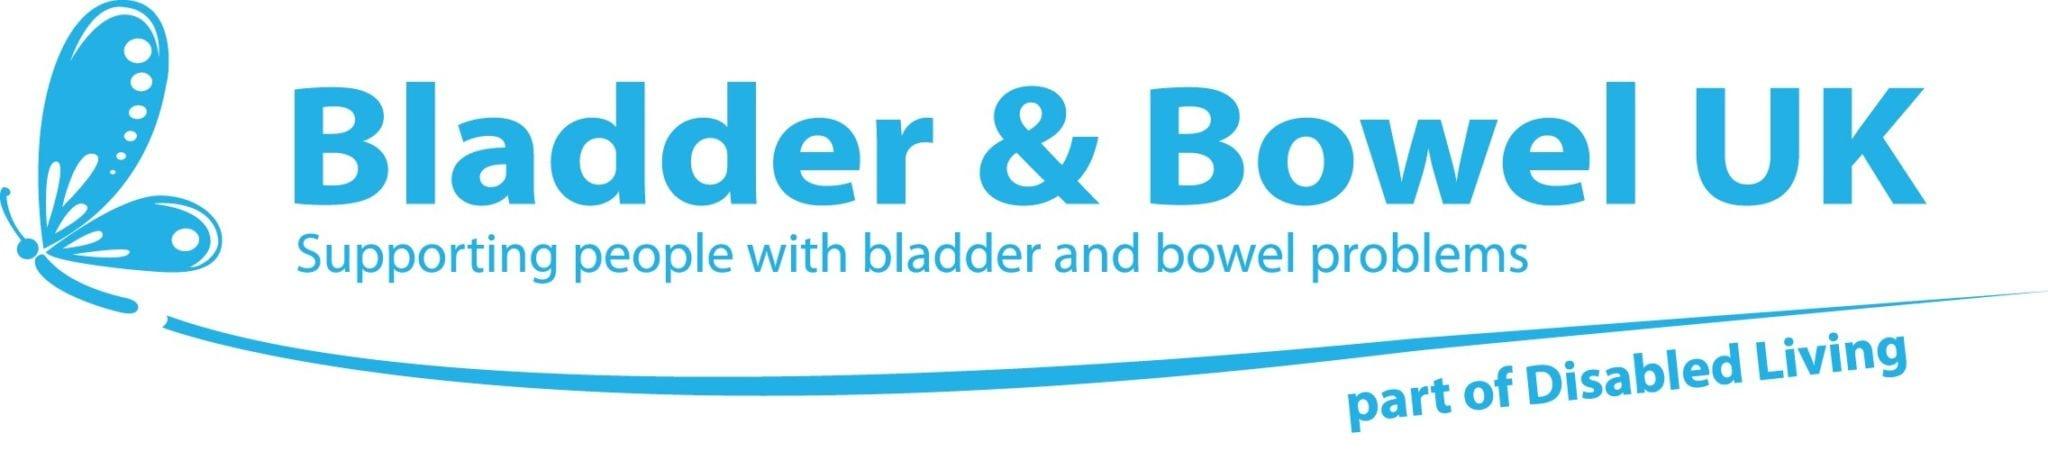 Bladder and Bower UK Logo